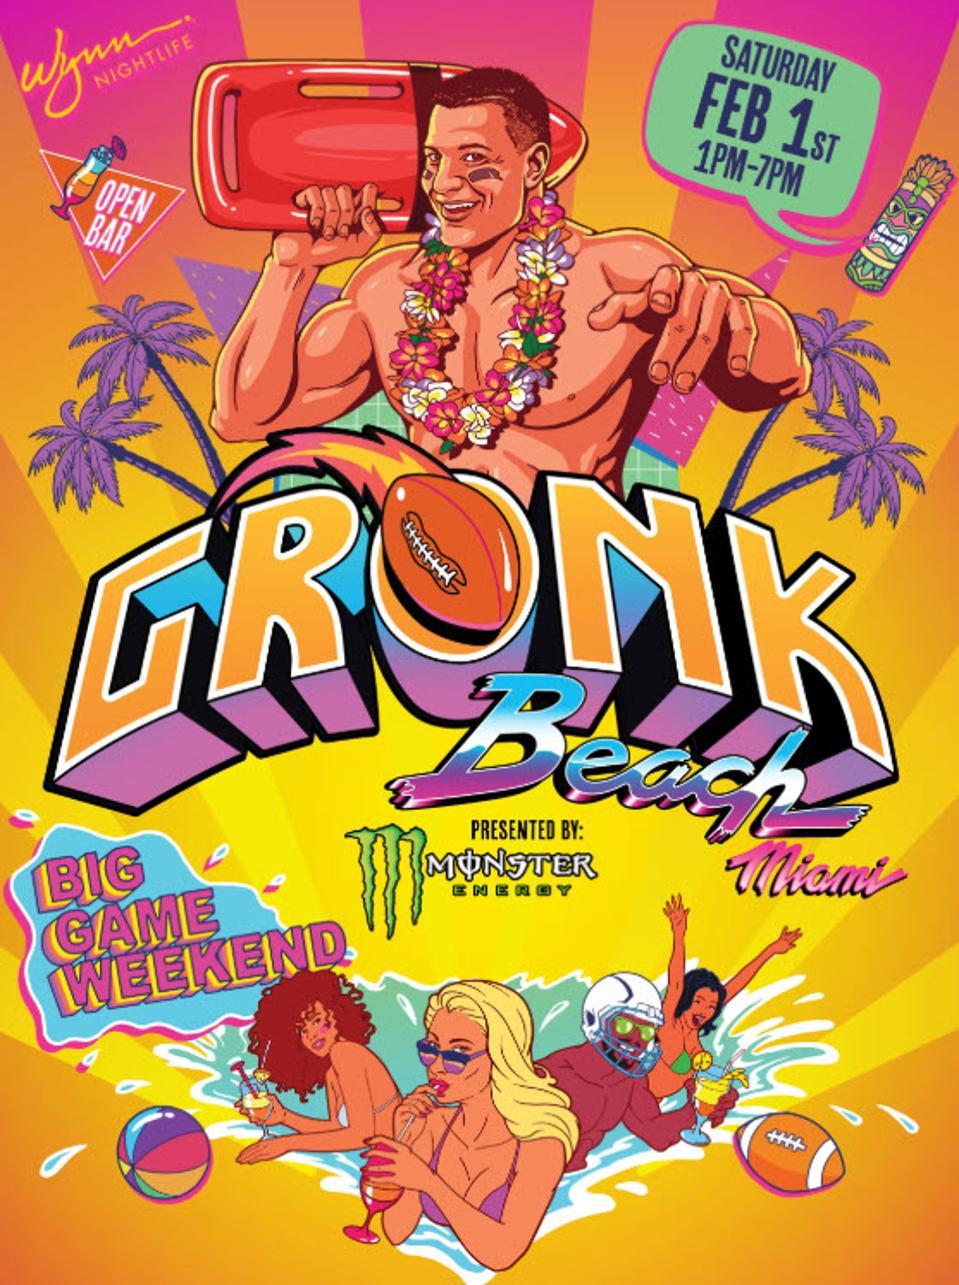 Gronk Beach